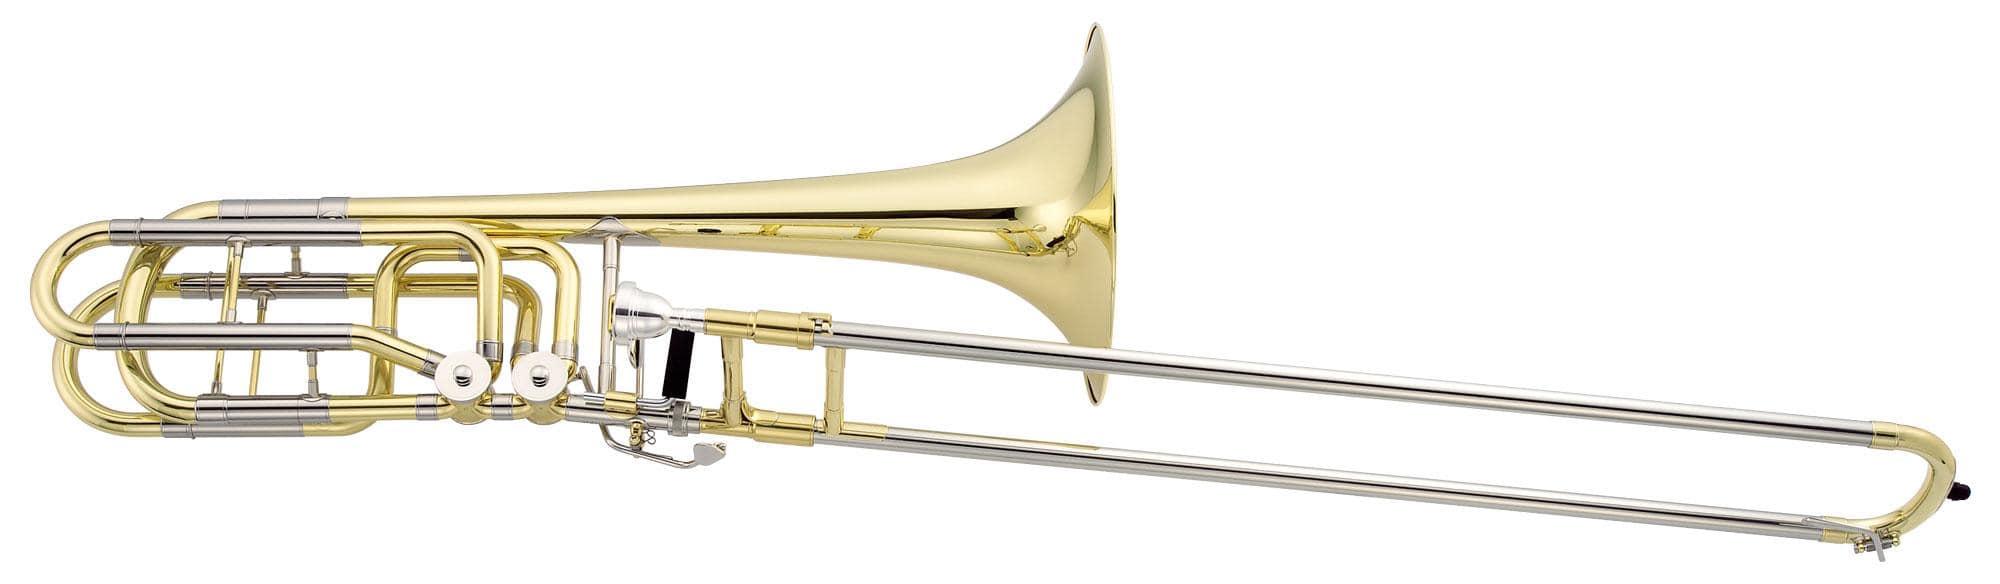 Posaunen - Jupiter JTB1180 Bassposaune - Onlineshop Musikhaus Kirstein